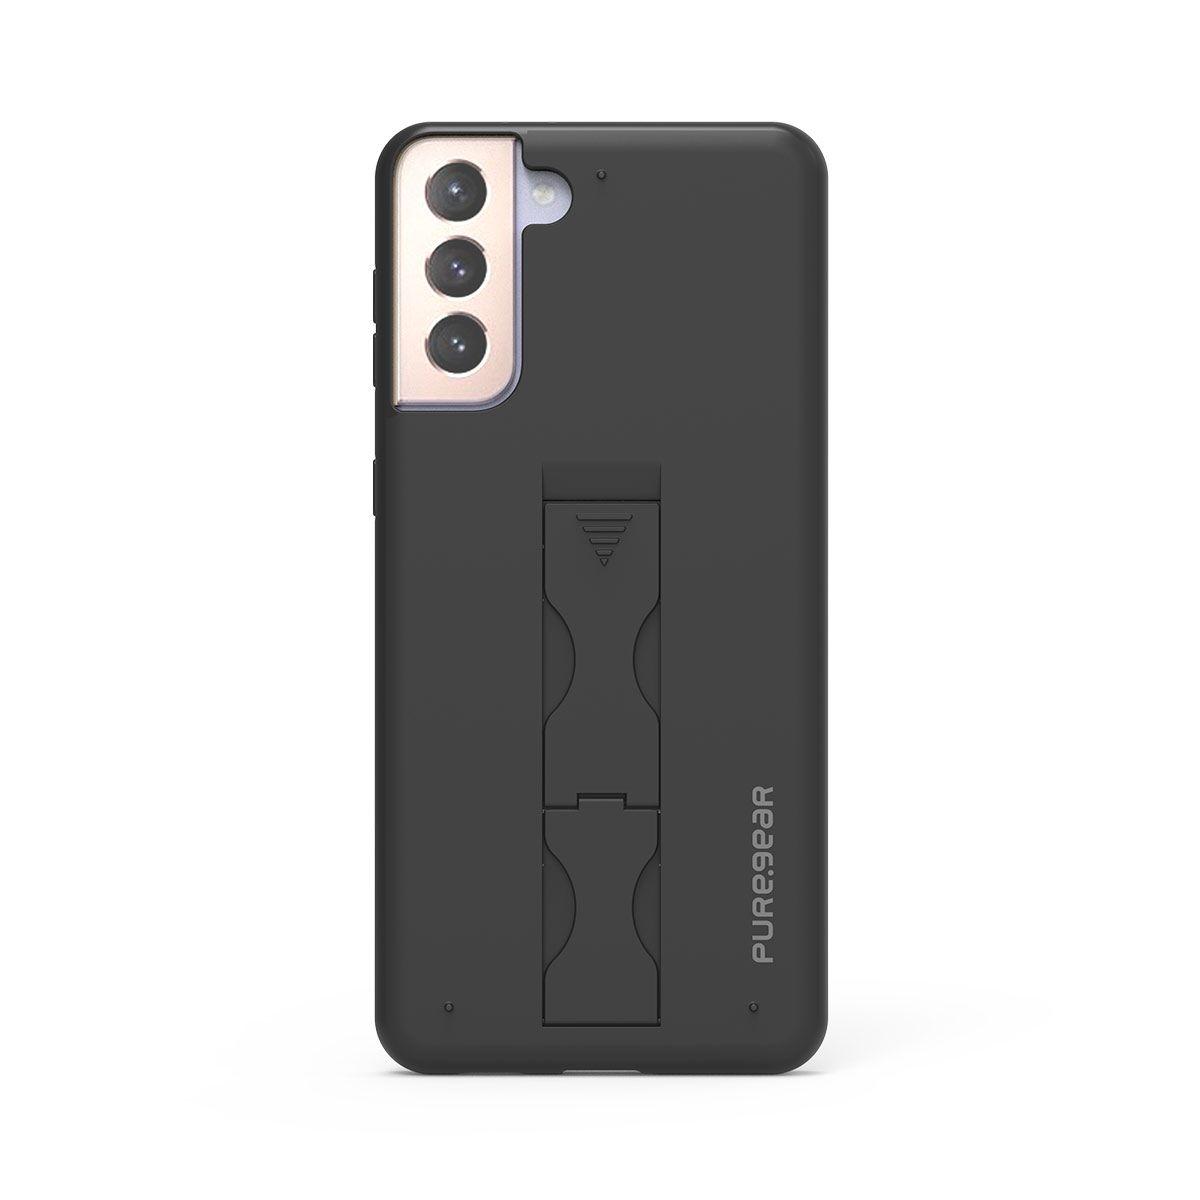 Samsung Galaxy S21+ 5G SlimStik, Antimicrobial Kickstand Case – Nightfall